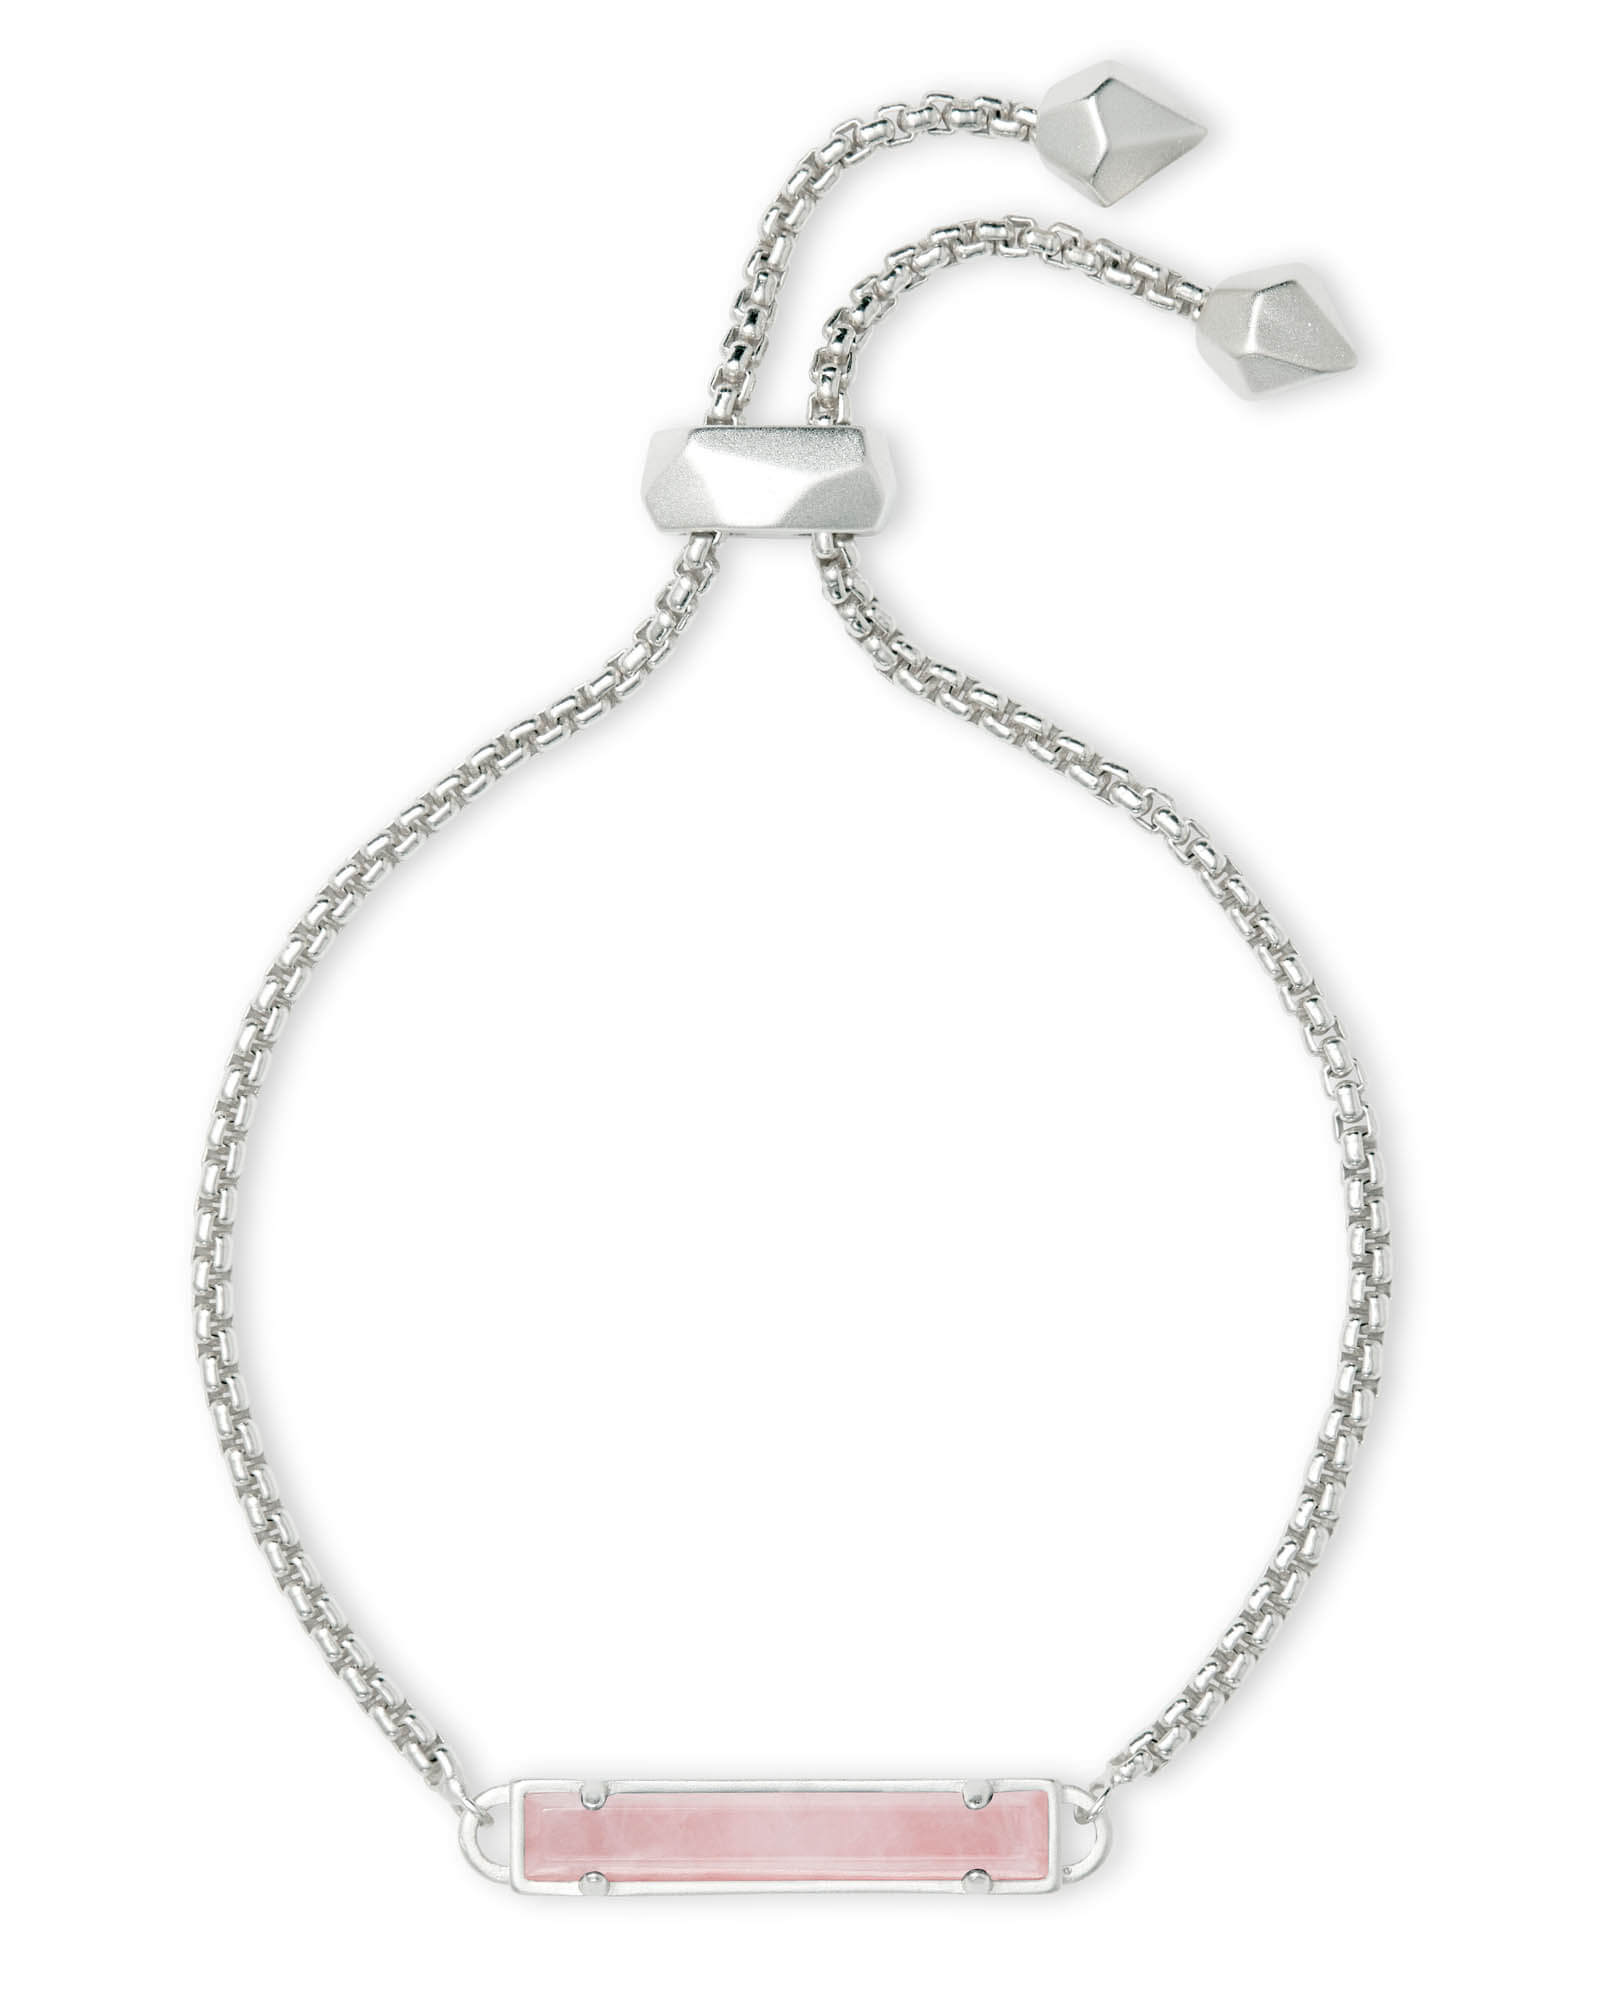 Kendra Scott Stan Silver Adjustable Chain Bracelet in Rose Quartz